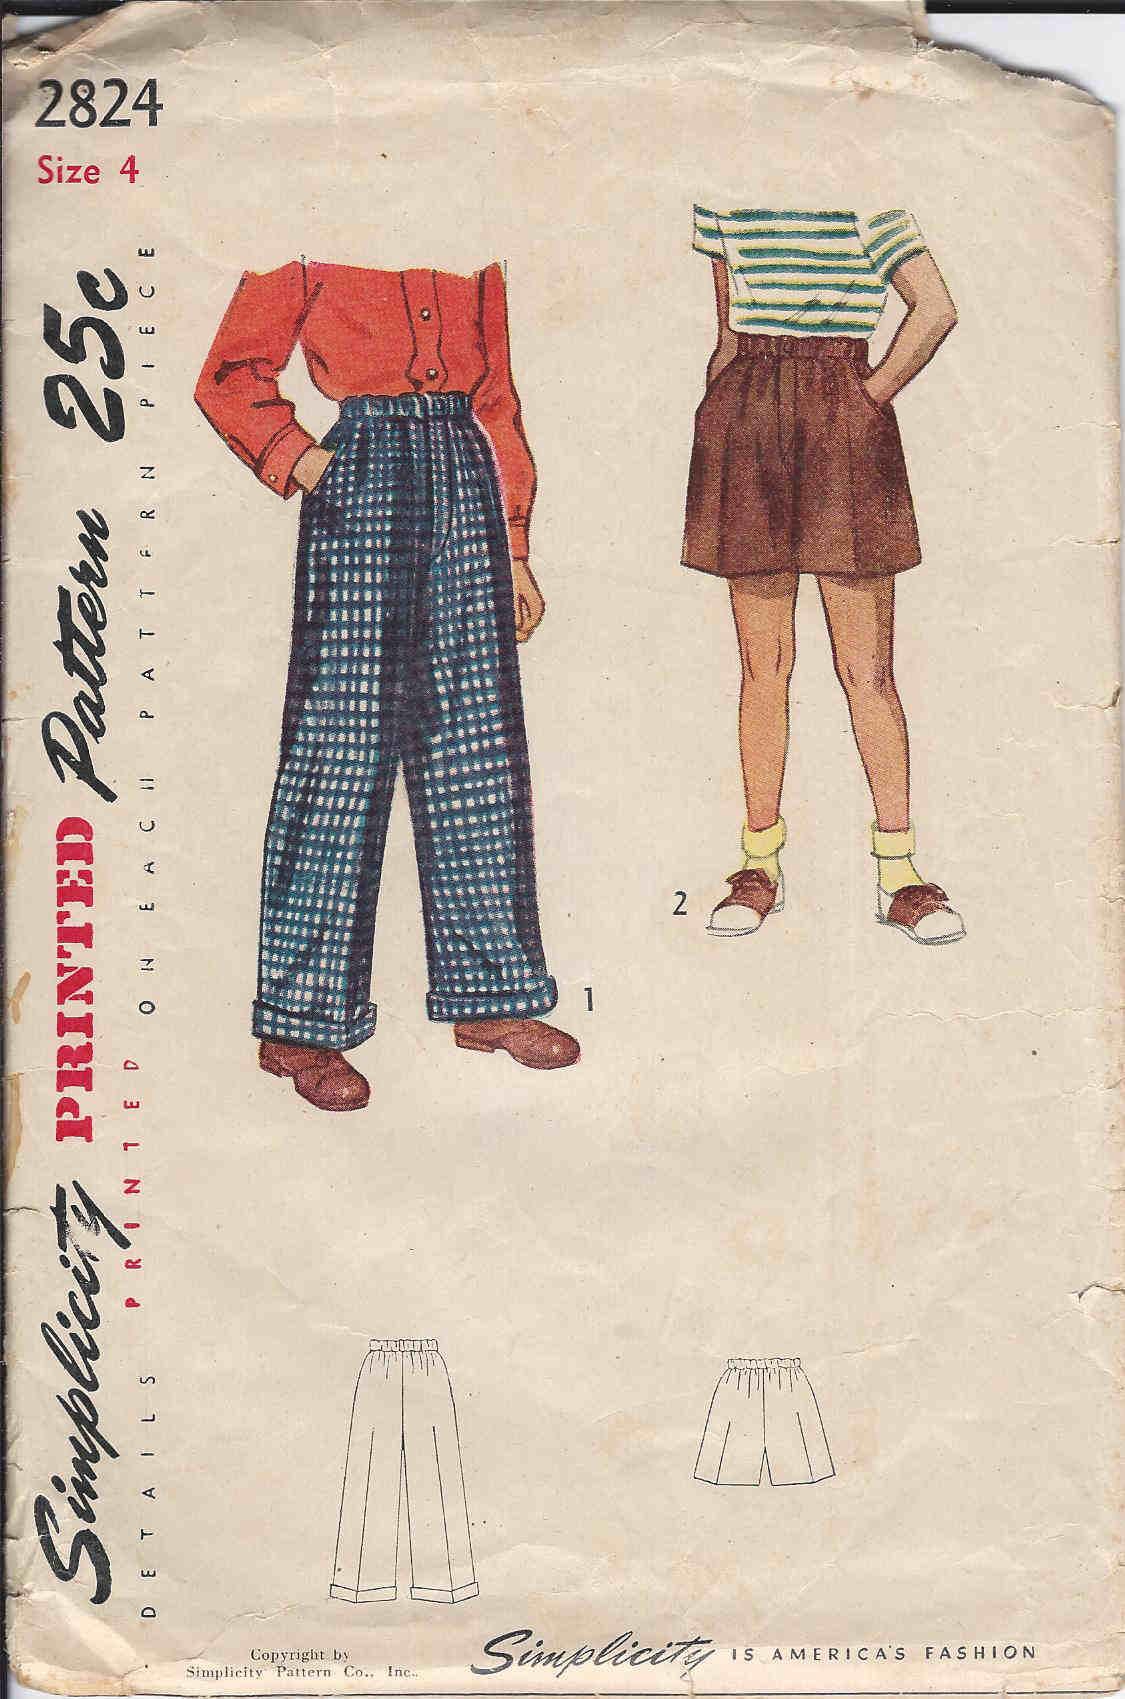 boxers shorts slacks sewing pattern